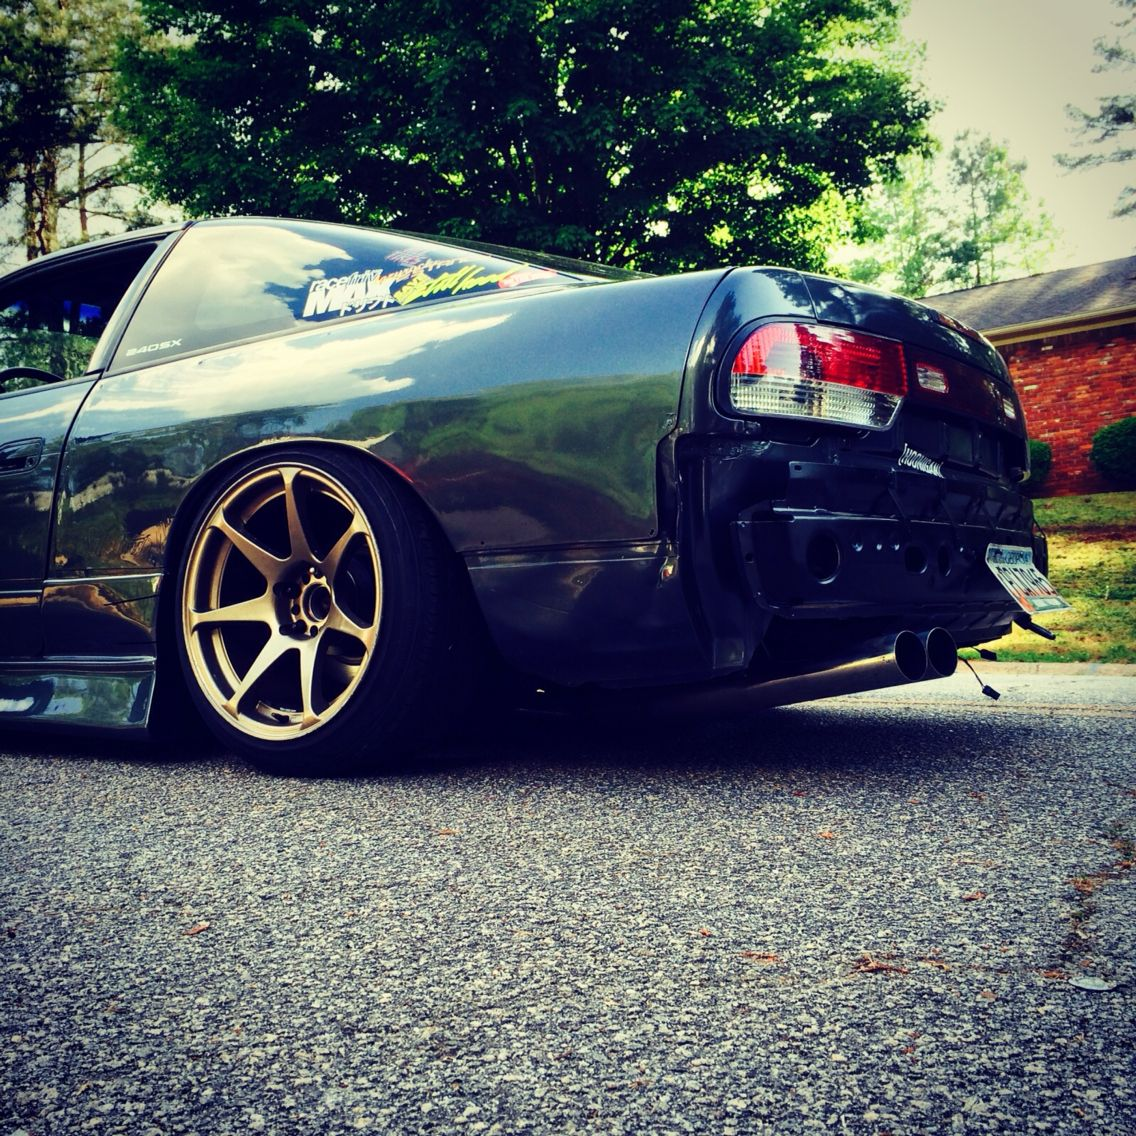 240sx Mb Battle Wheels Nissan 240sx S13s14s15 Silvia Jdm Cars